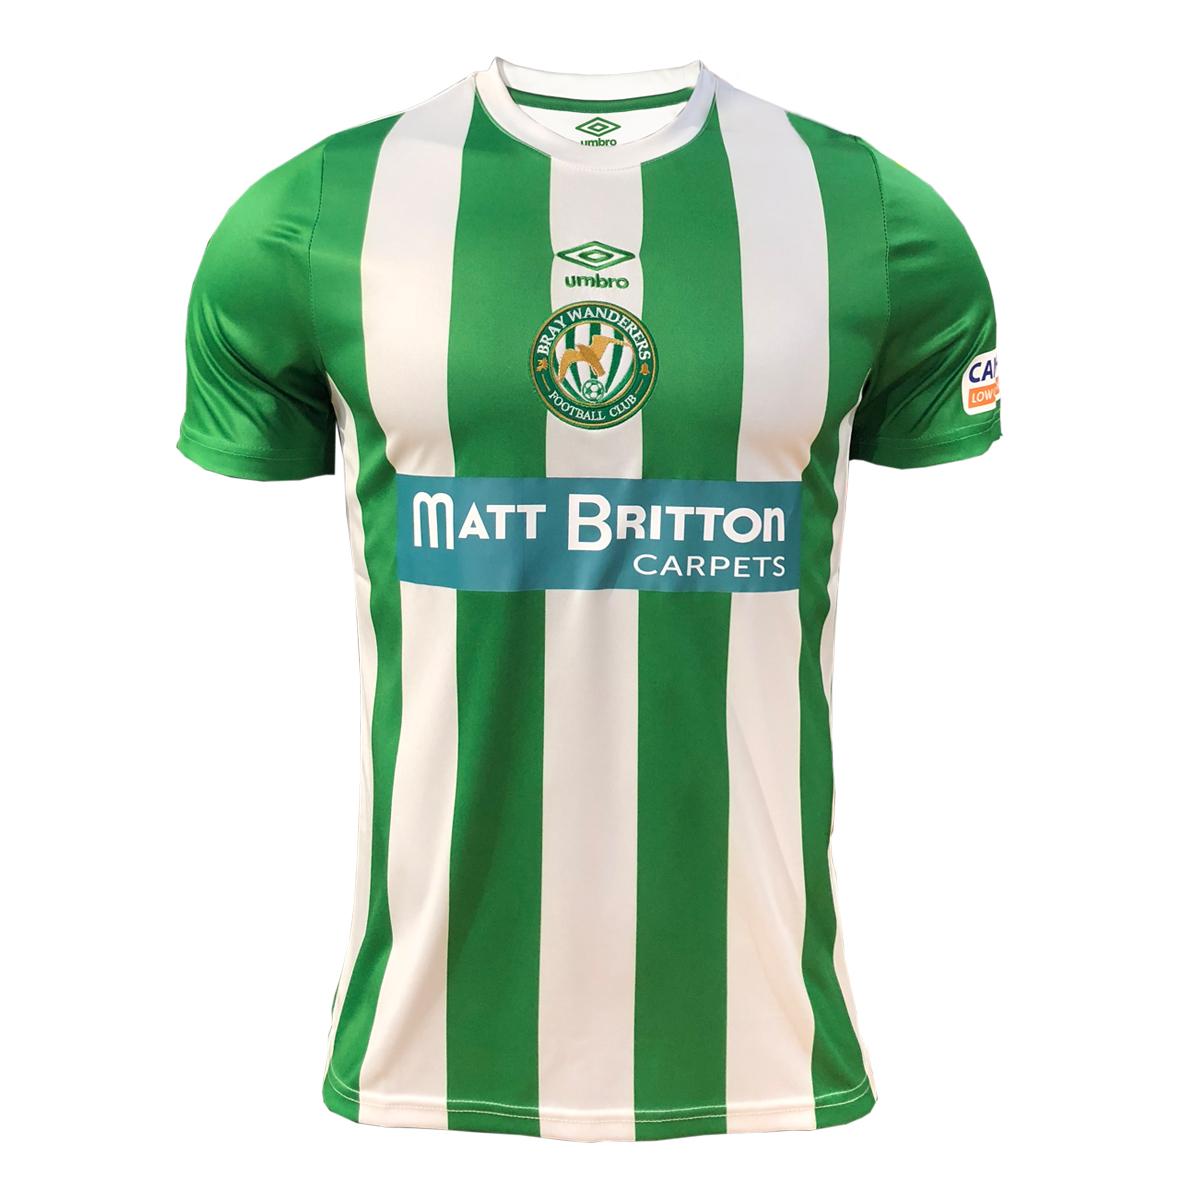 e5b86cbf41cdb OFFICIAL 2019 HOME JERSEY - Bray Wanderers FC